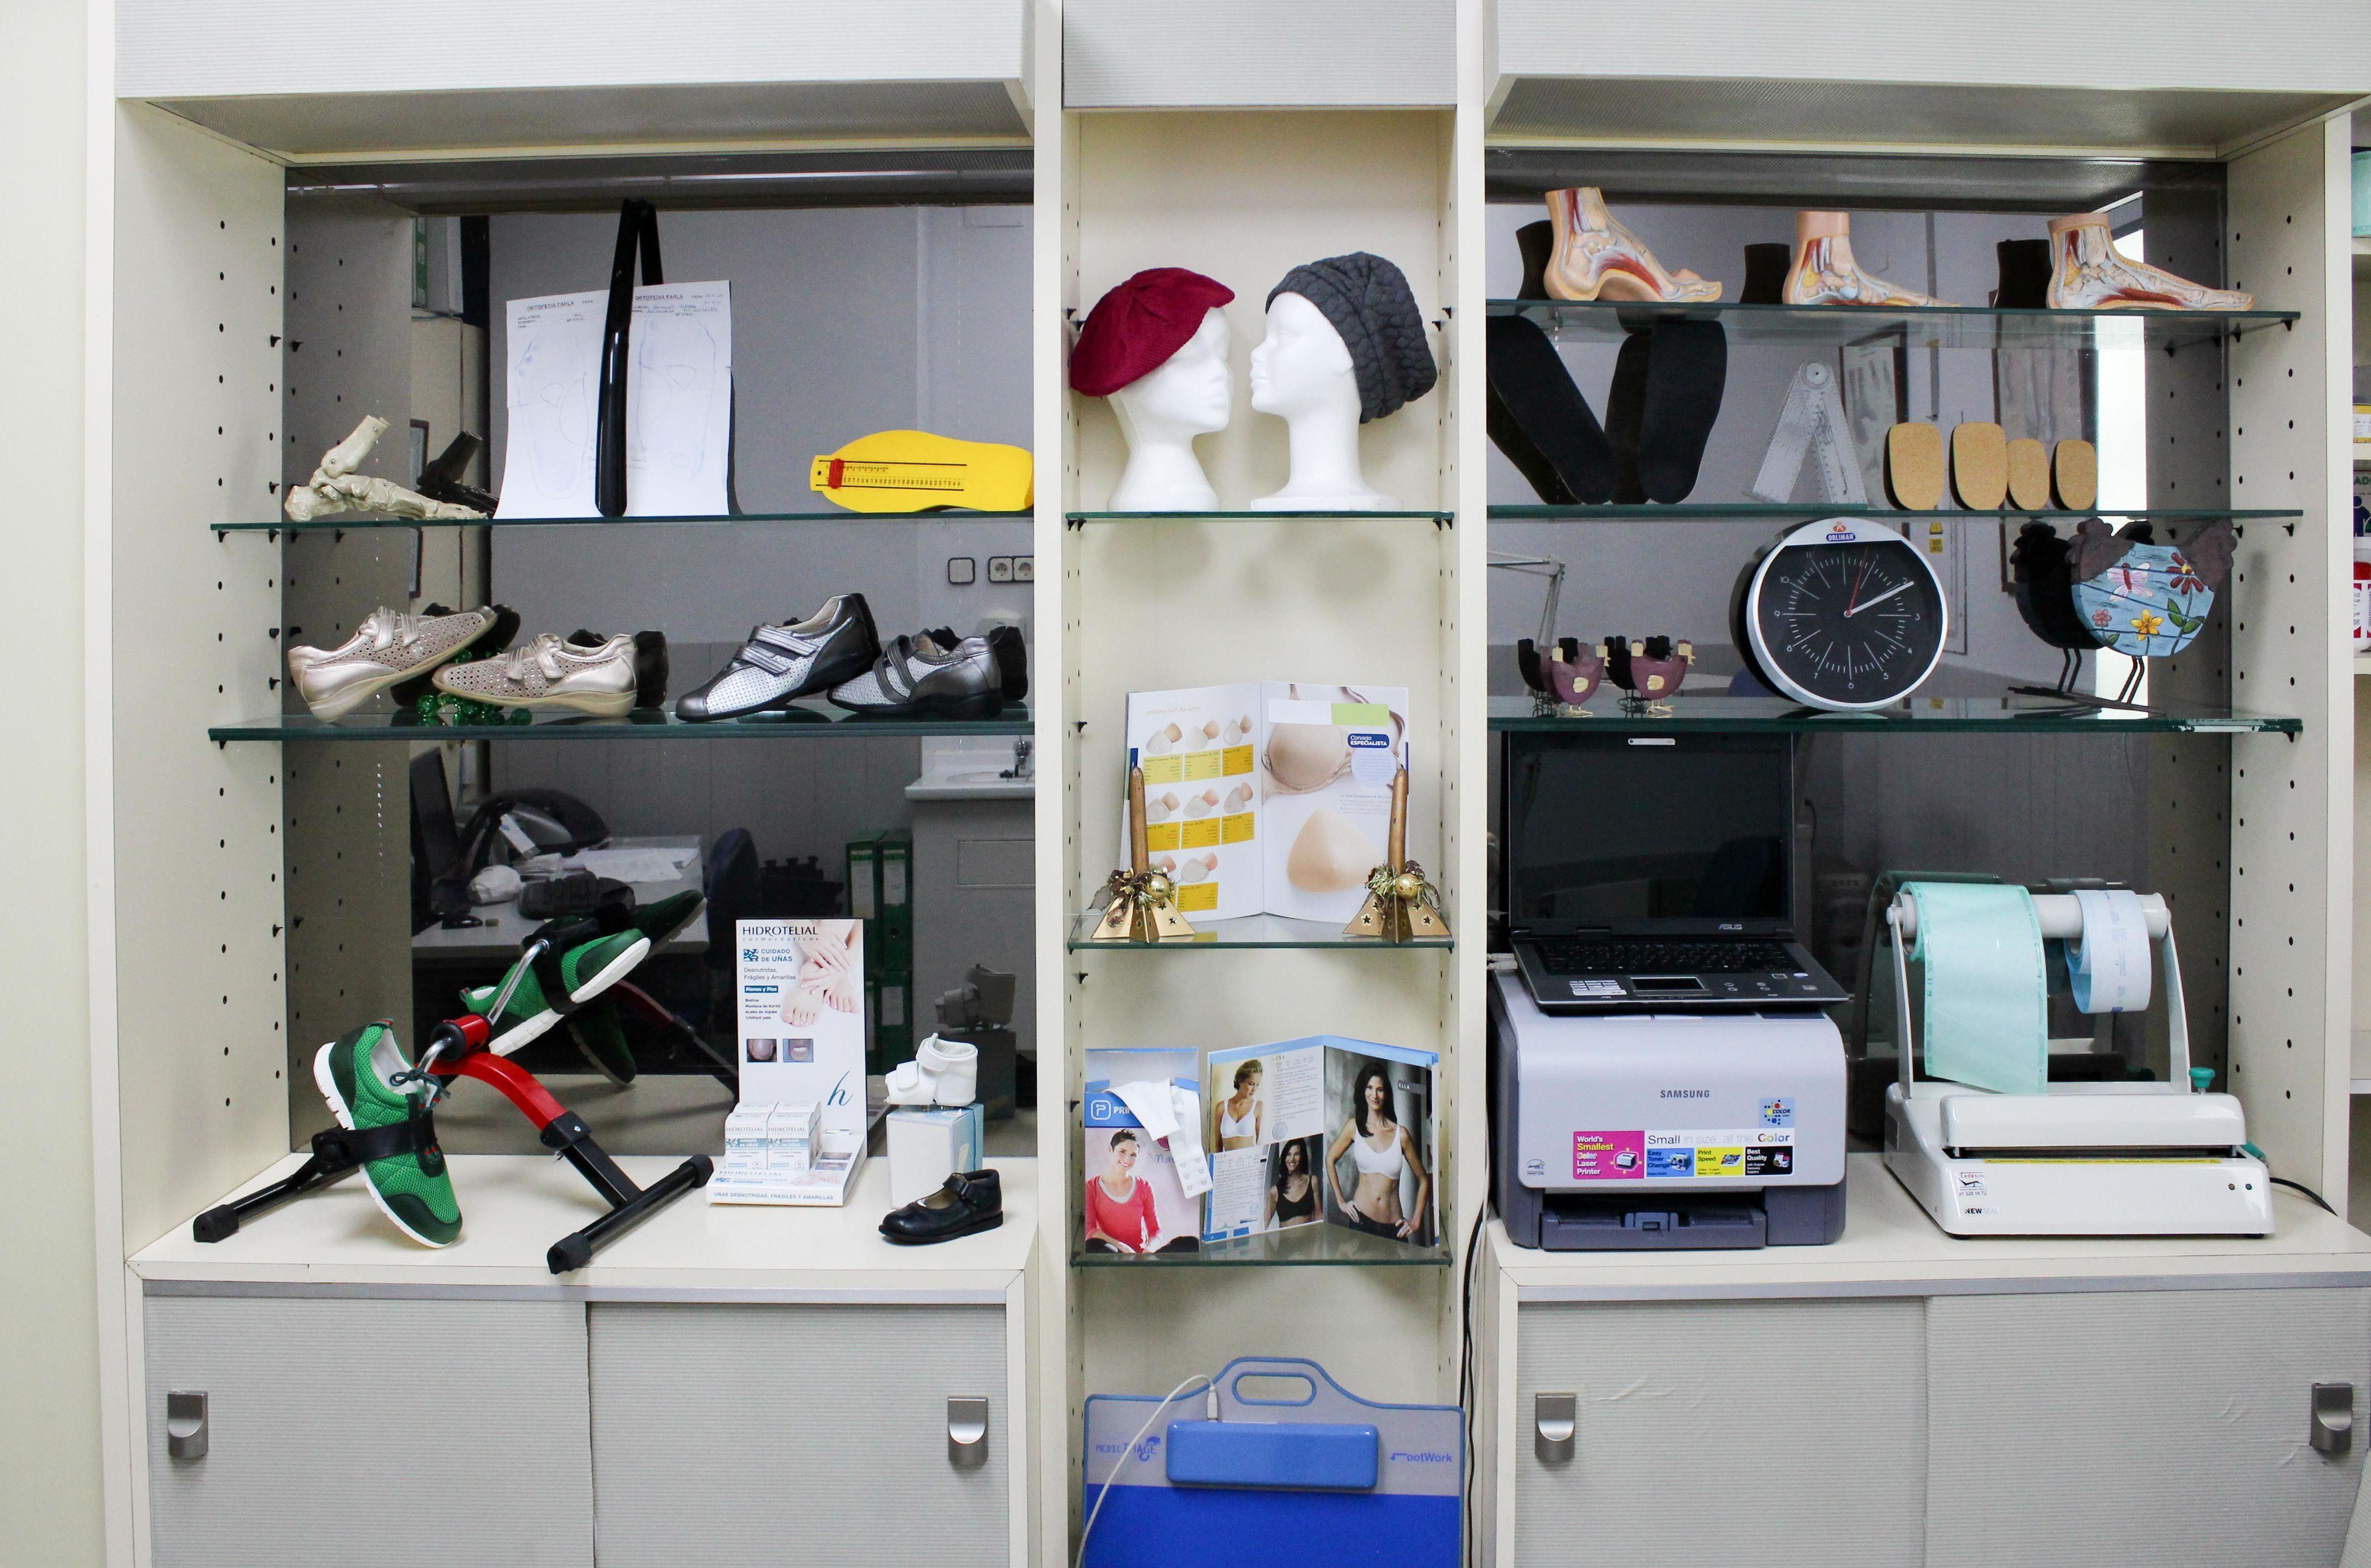 Foto 1 de Ortopedia en Parla | Ortopedia Parla